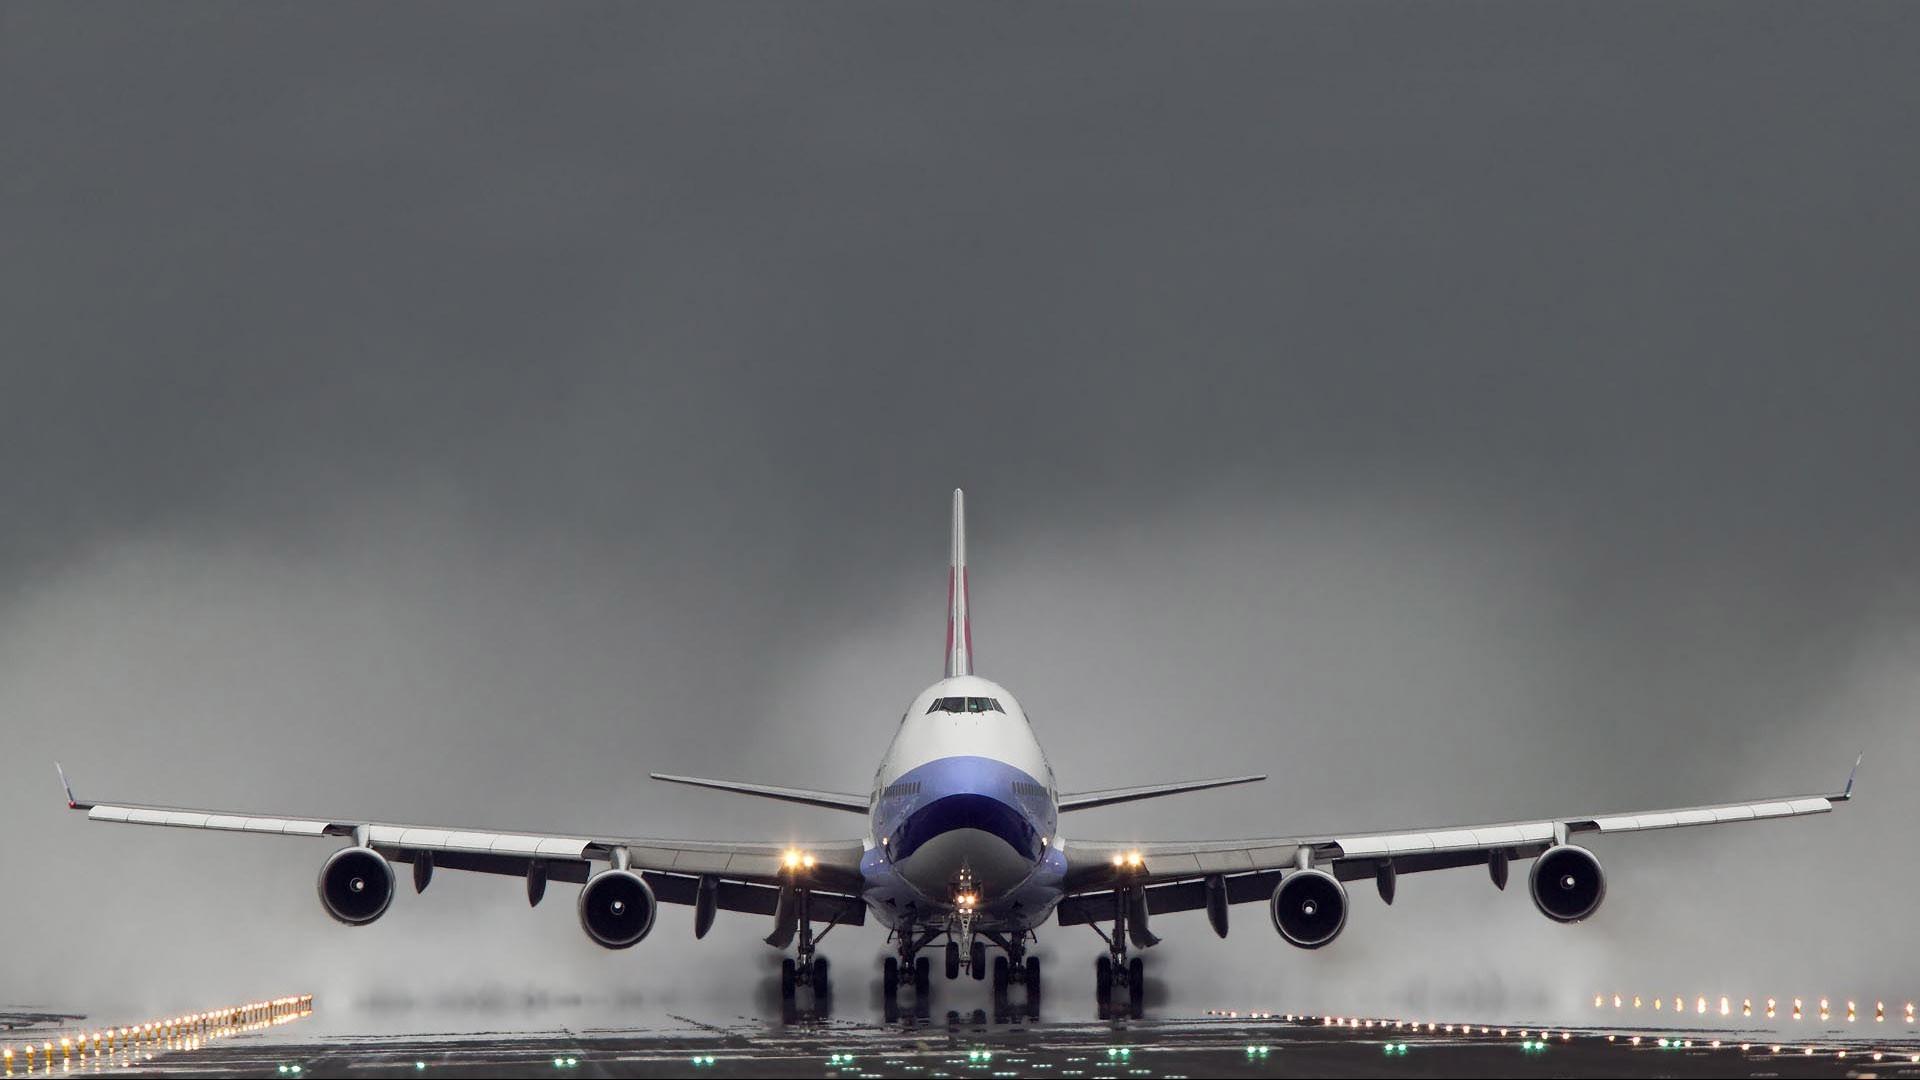 43 boeing 747 wallpaper on wallpapersafari - Boeing wallpapers for desktop ...